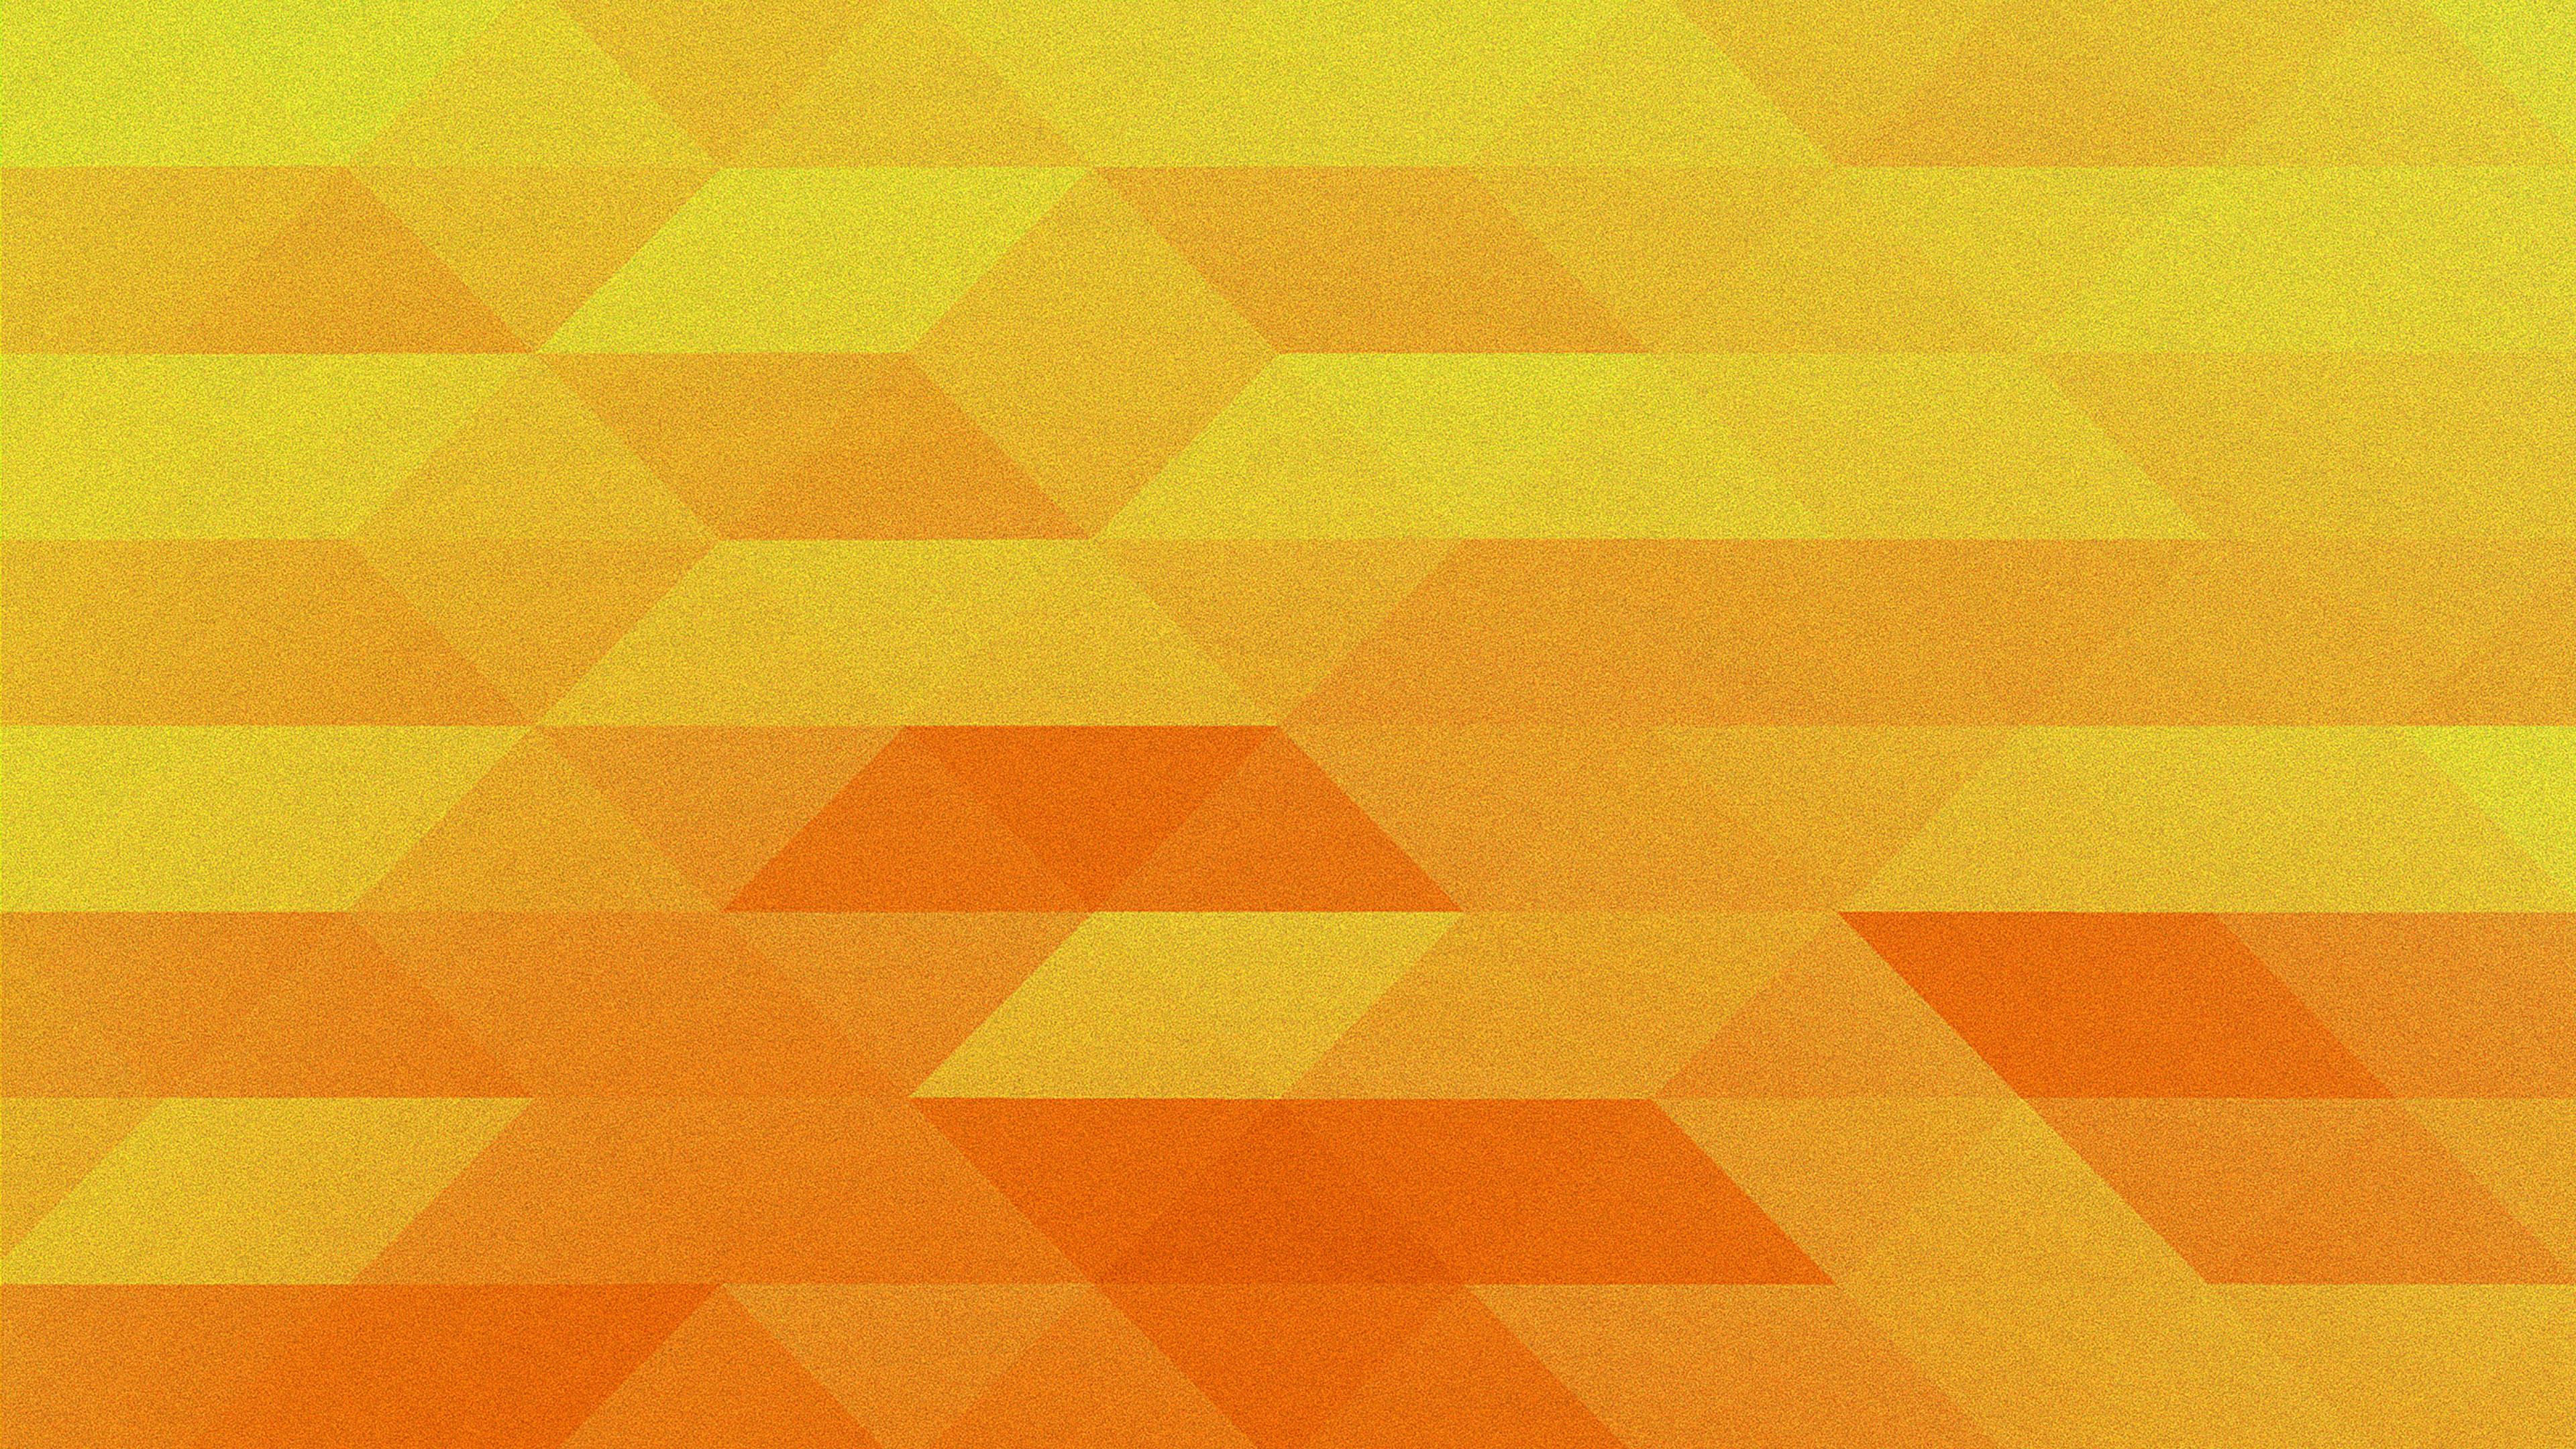 va38-orange-yellow-patterns - Papers.co